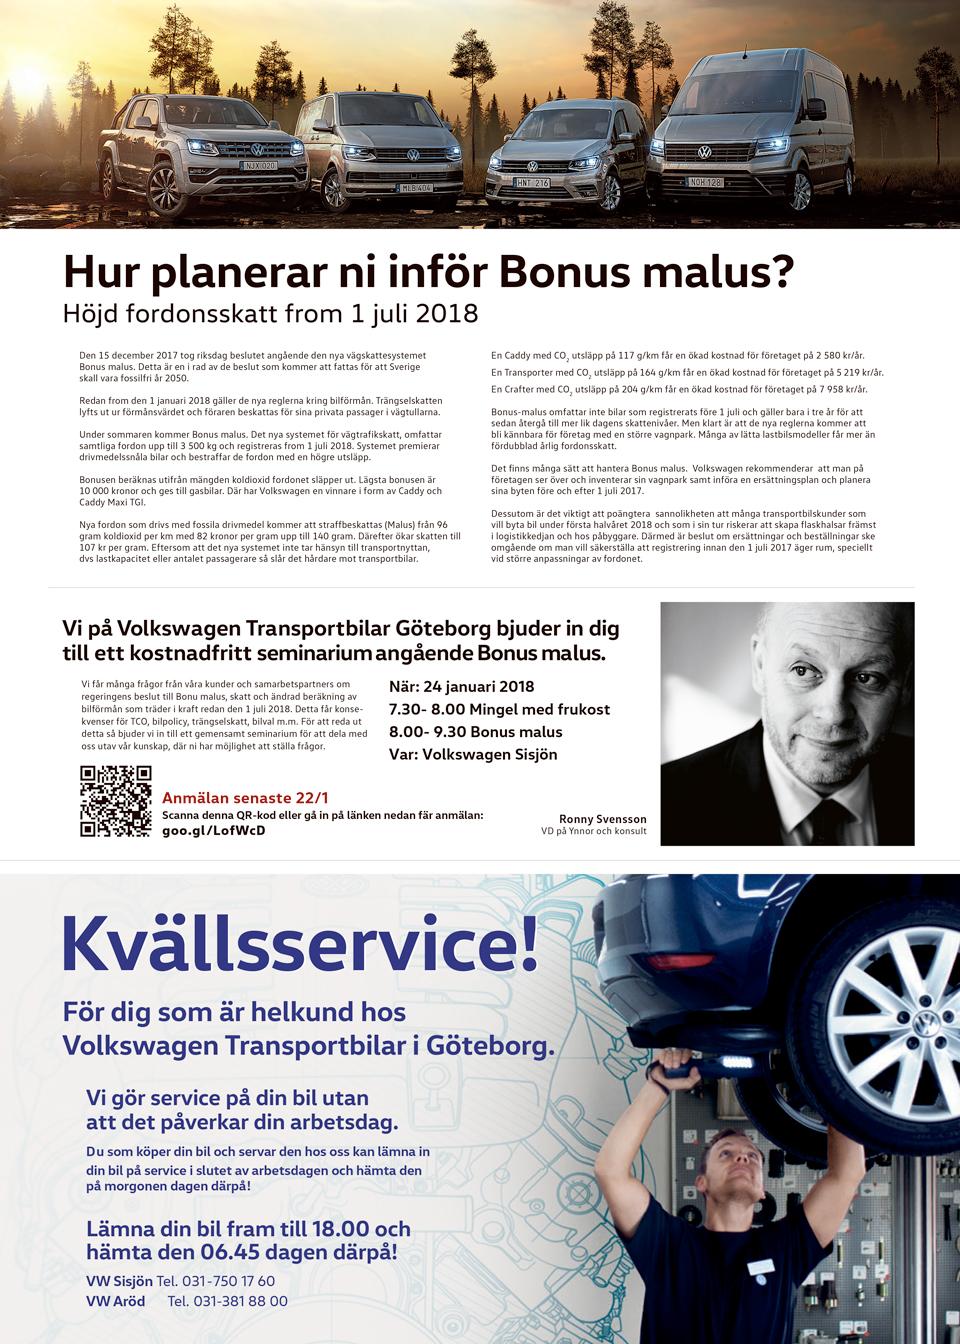 1-transportbilar-erbjudande-utskick-vw-transportbilar-goteborg-bonus-malus-kvallservice